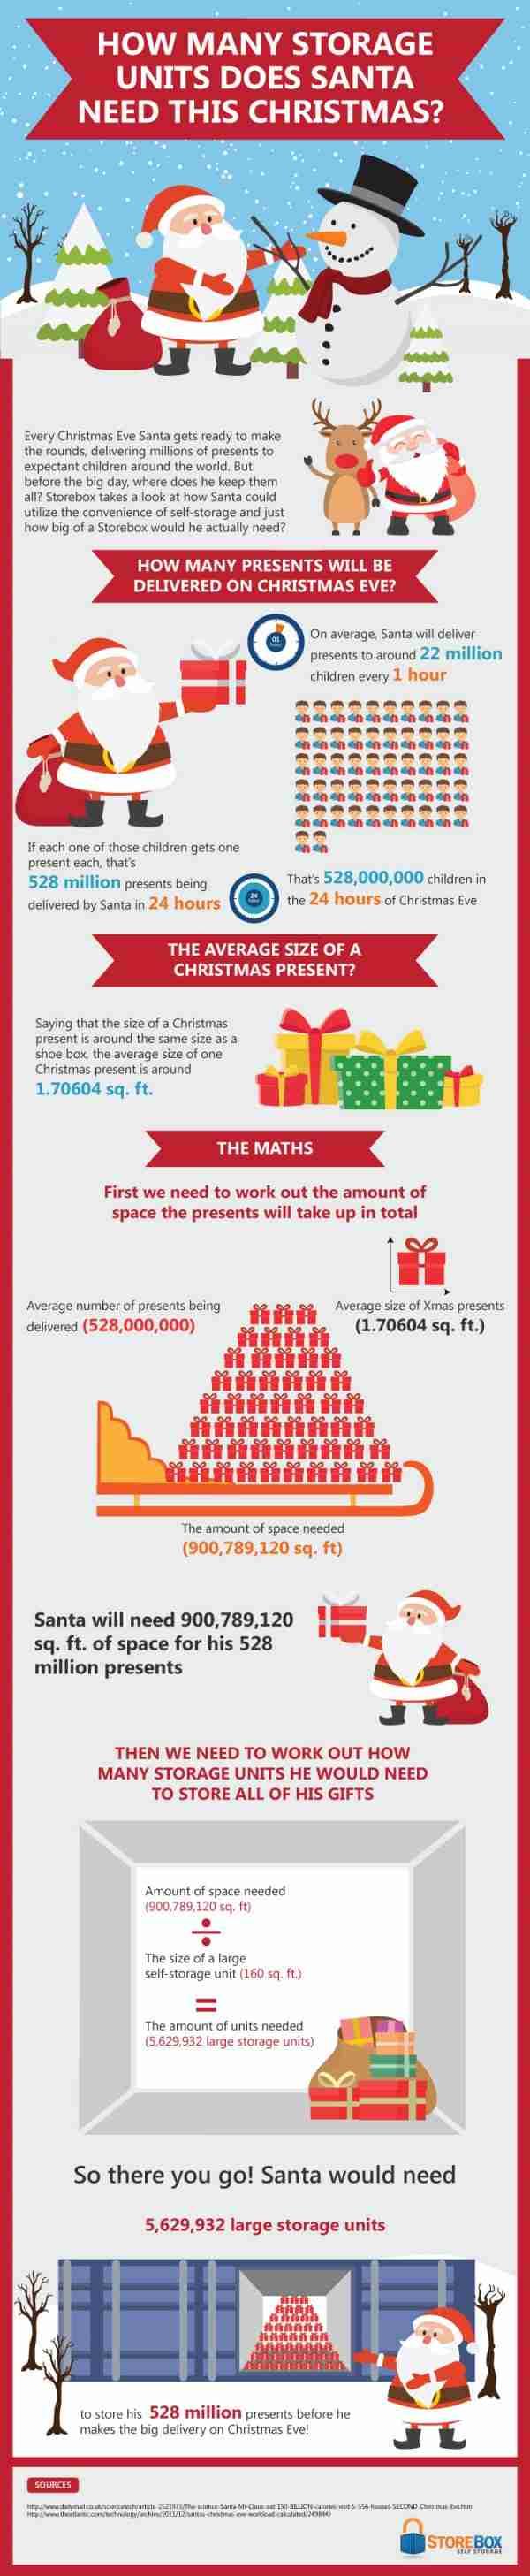 how-many-storage-units-would-santa-need-storebox